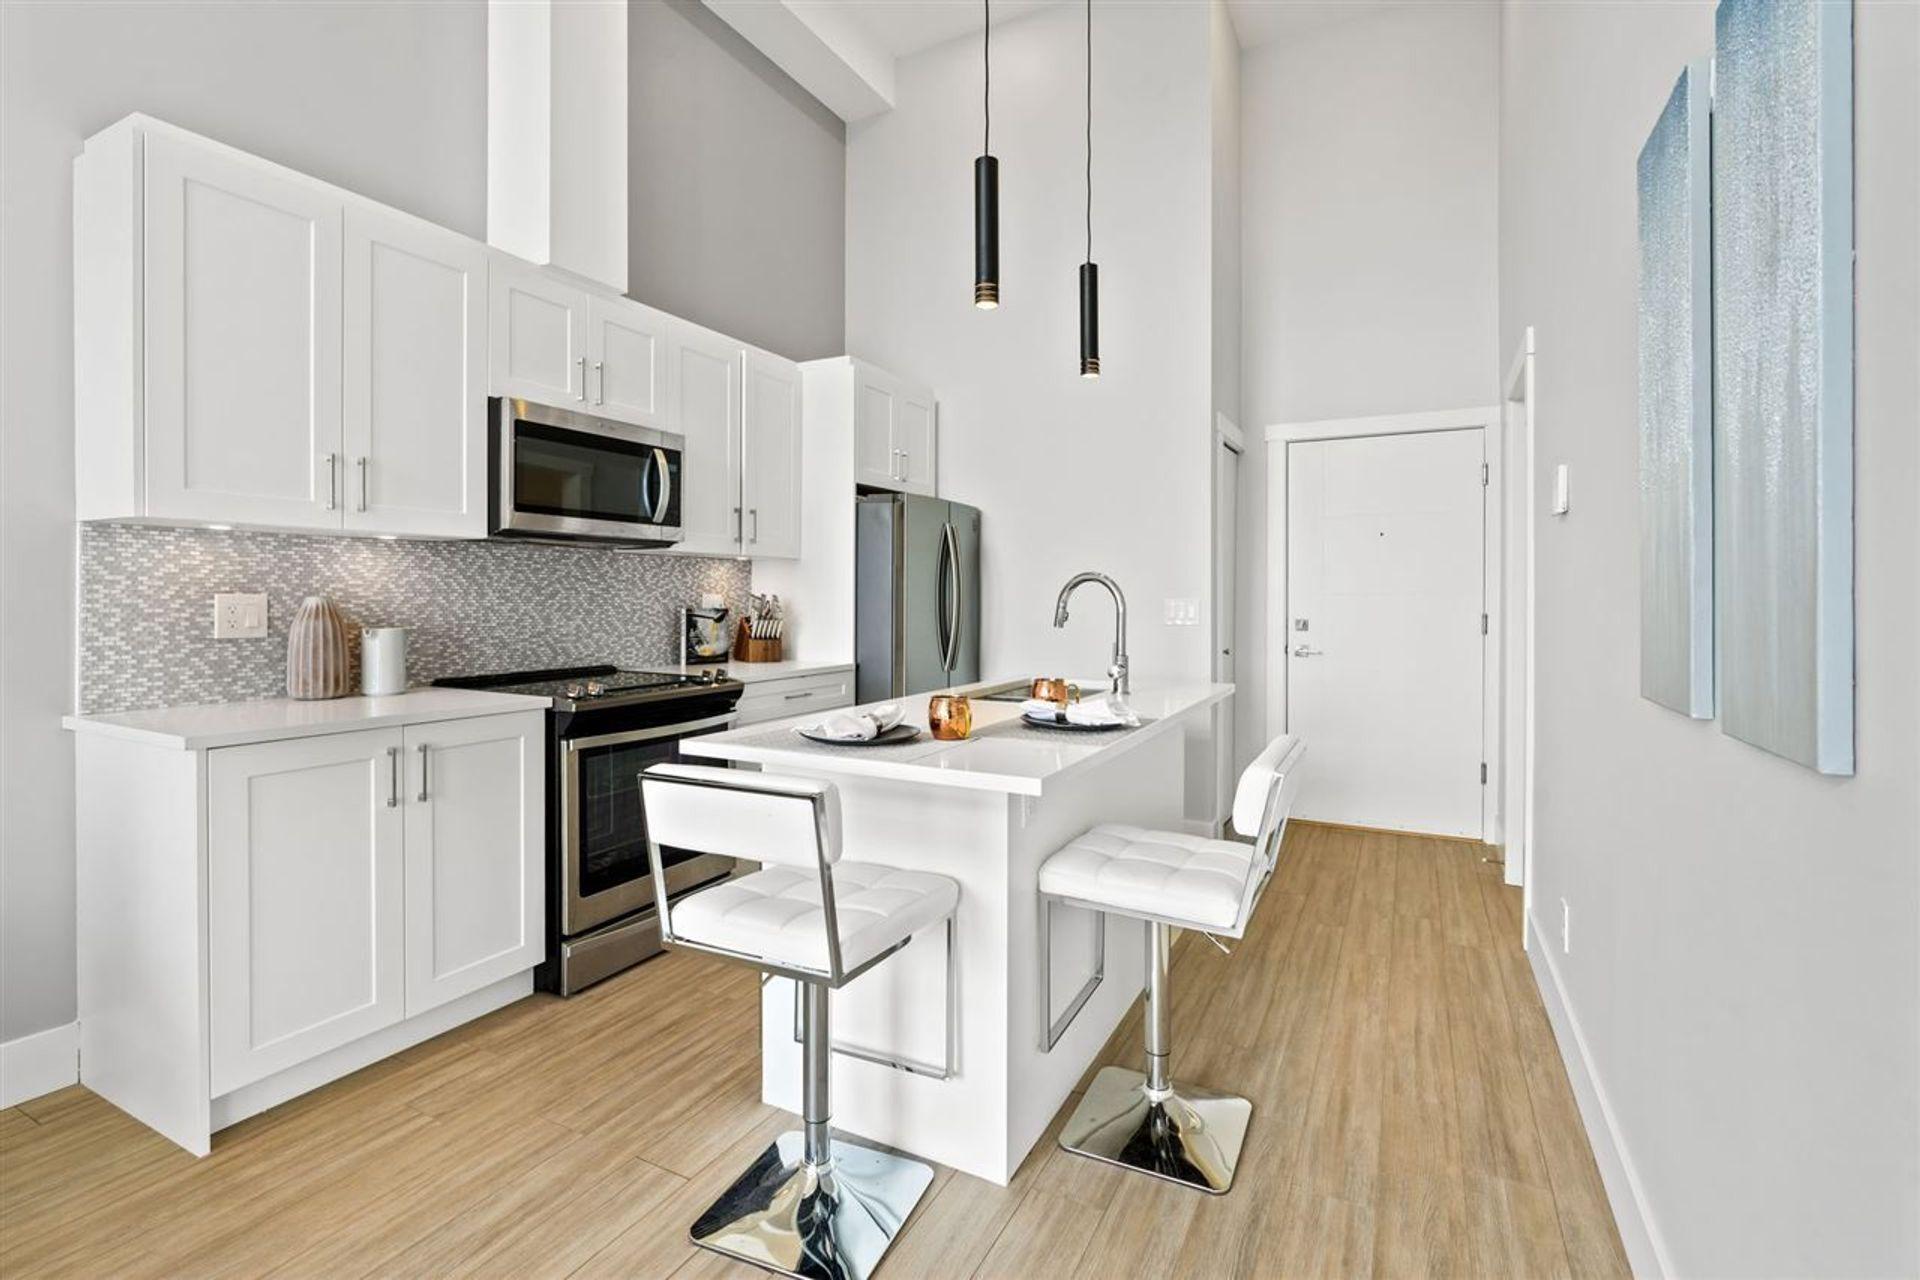 22335-mcintosh-avenue-east-central-maple-ridge-06 of 603 - 22335 Mcintosh Avenue, East Central, Maple Ridge